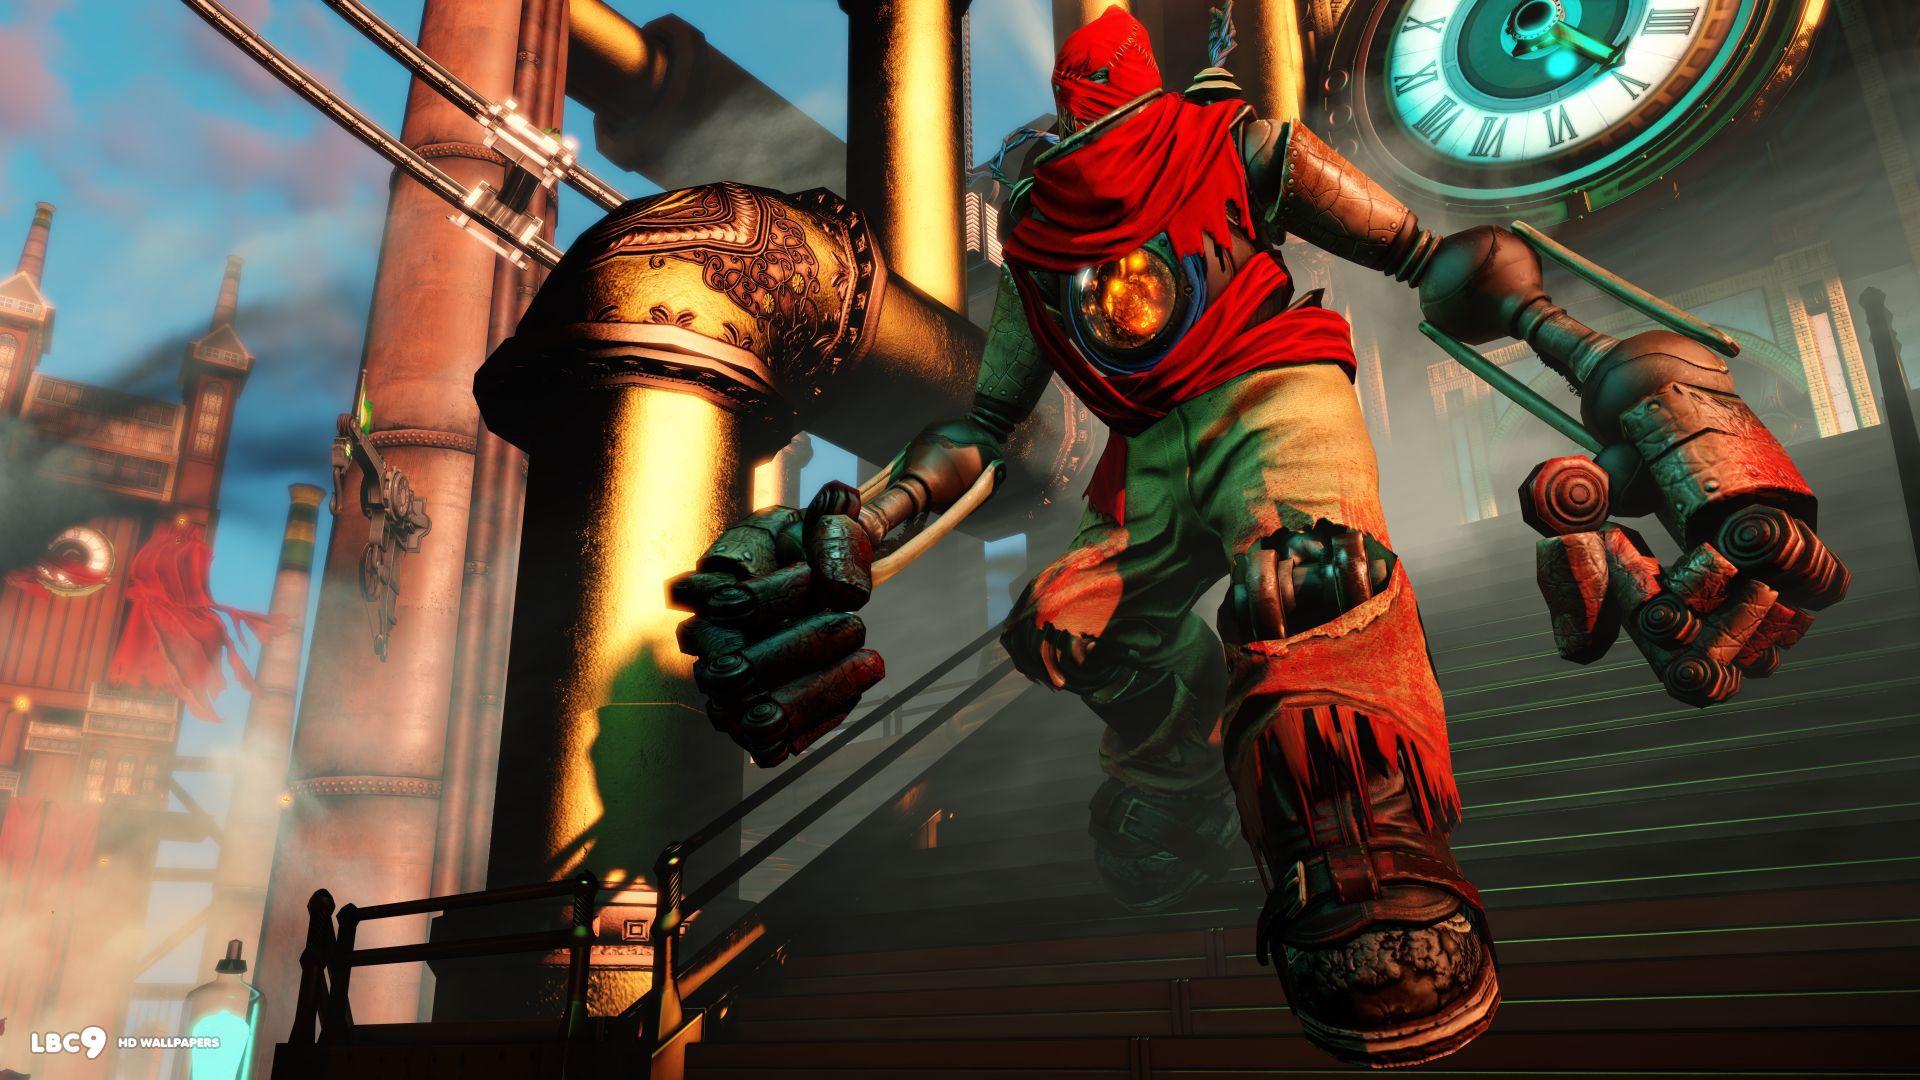 Handyman-red-bioshock-infinite-wallpaper.jpg